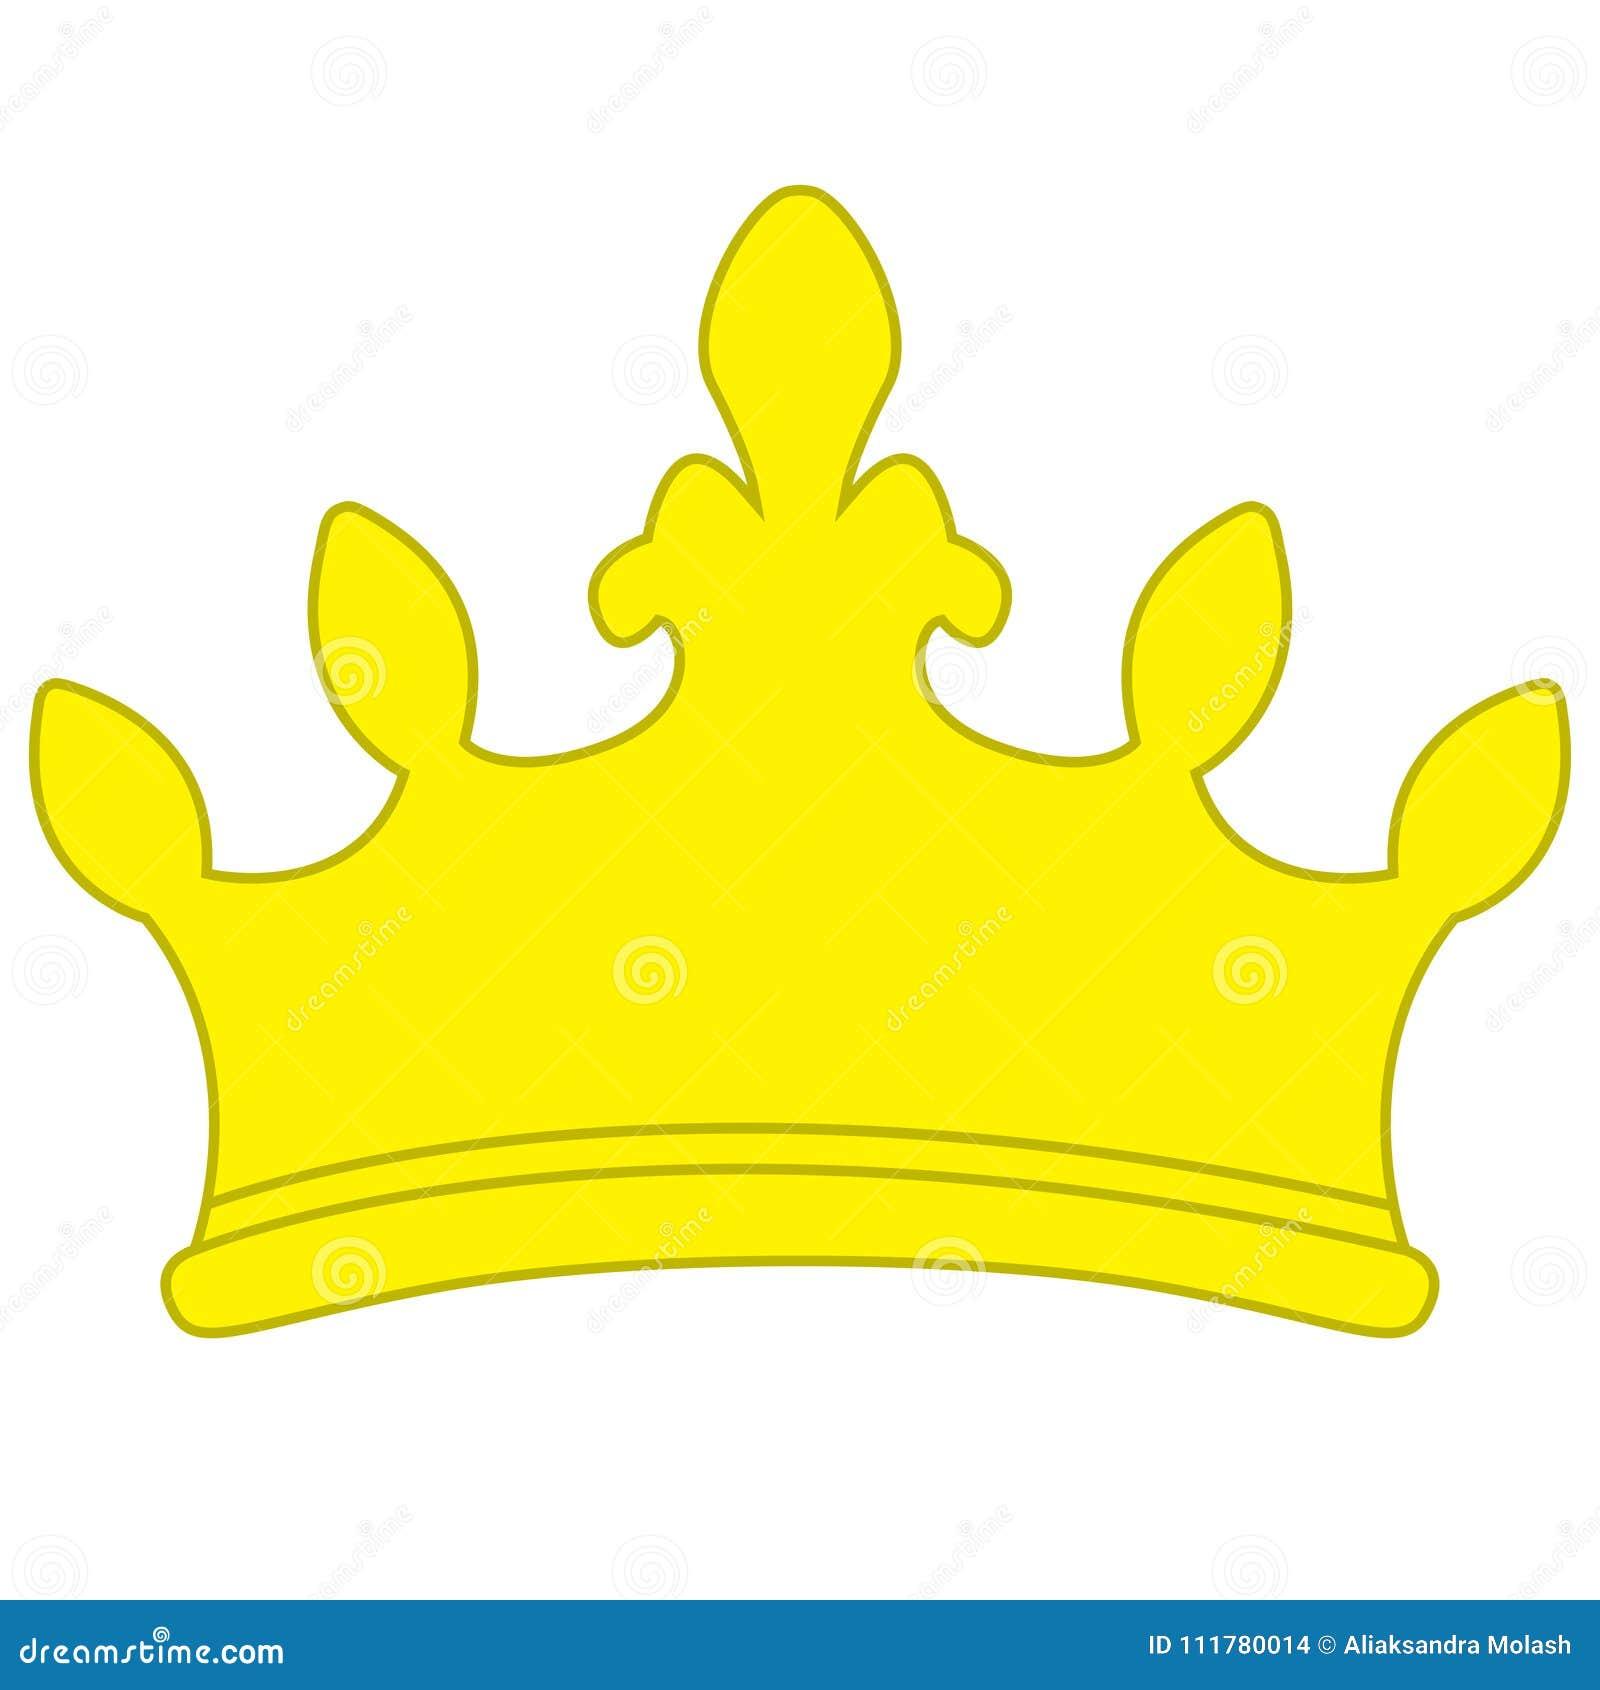 Golden yellow crown icon symbol